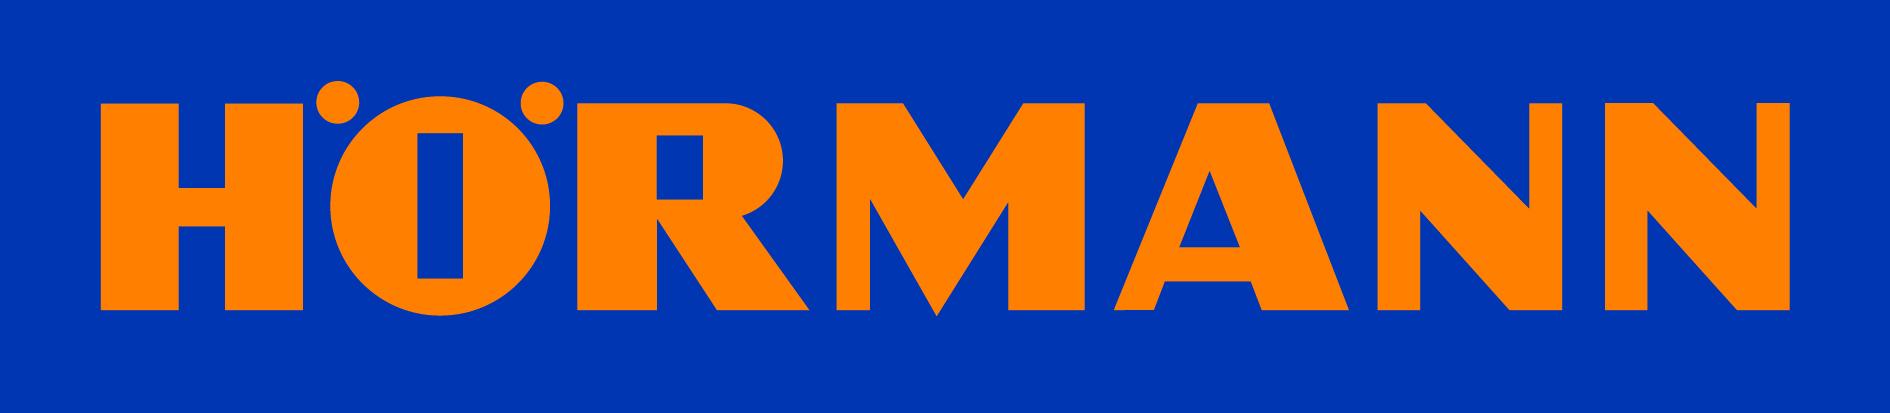 hormann logo